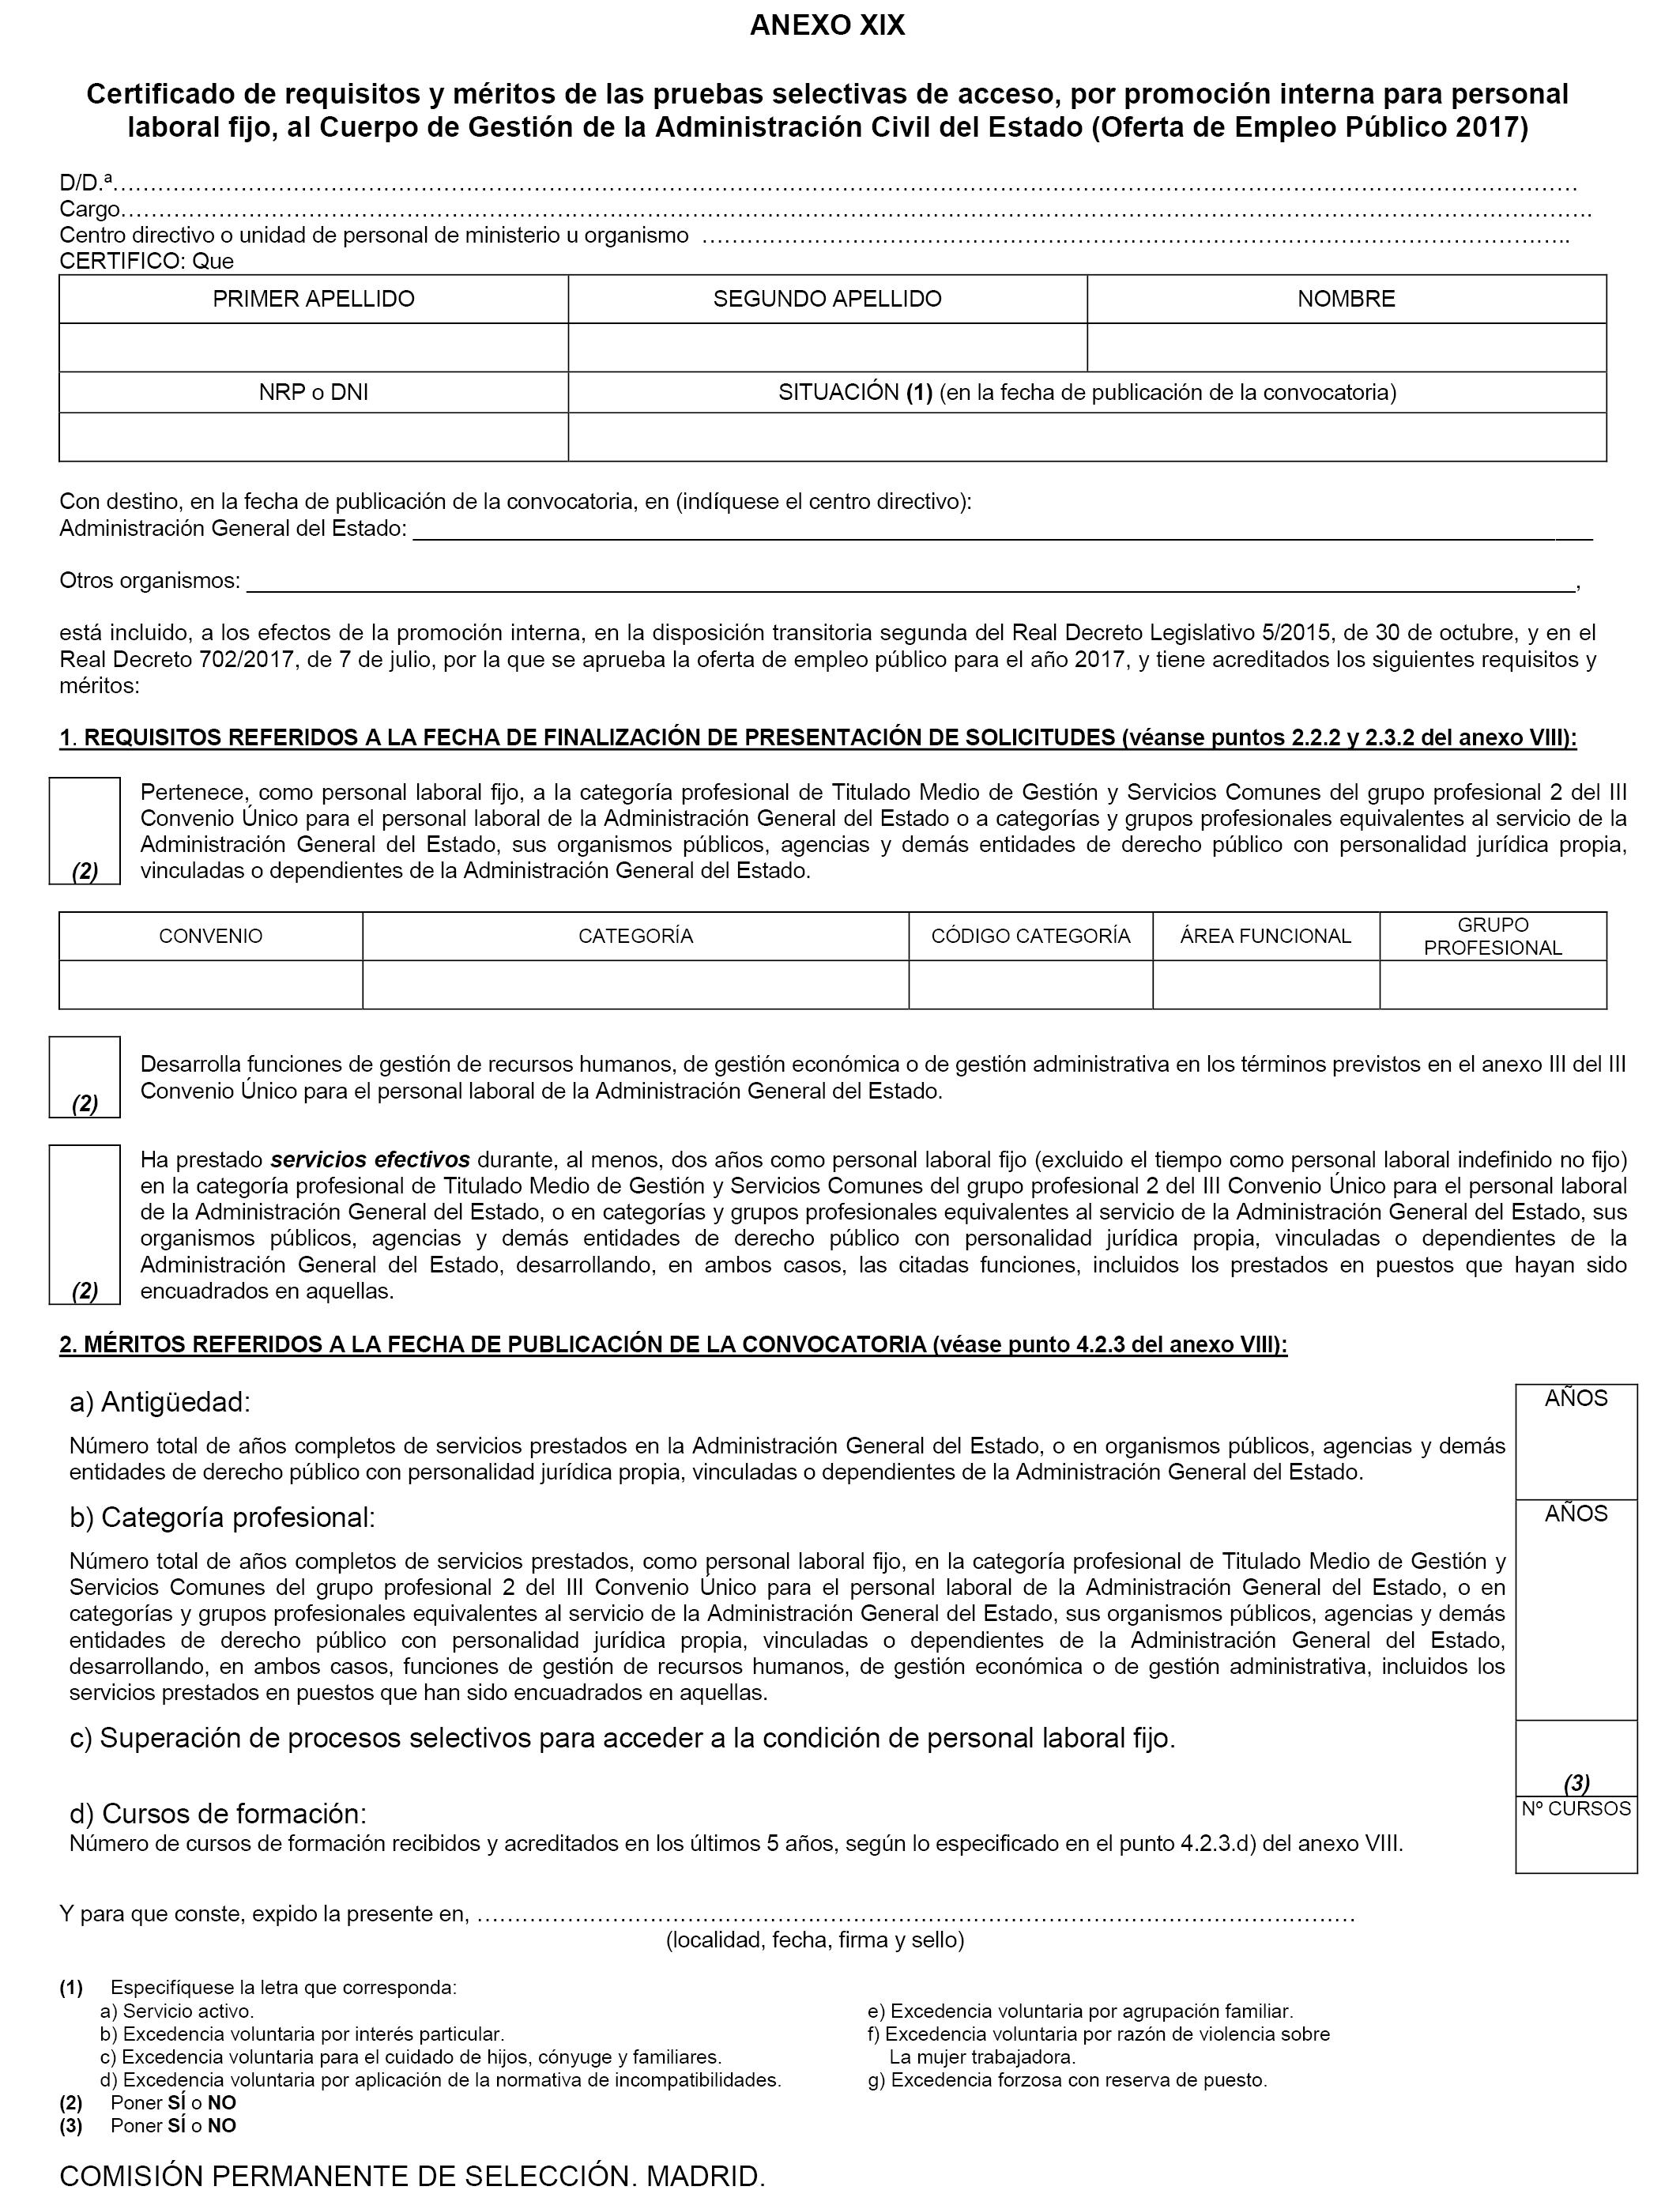 Boe Es Documento Boe A 2018 1169